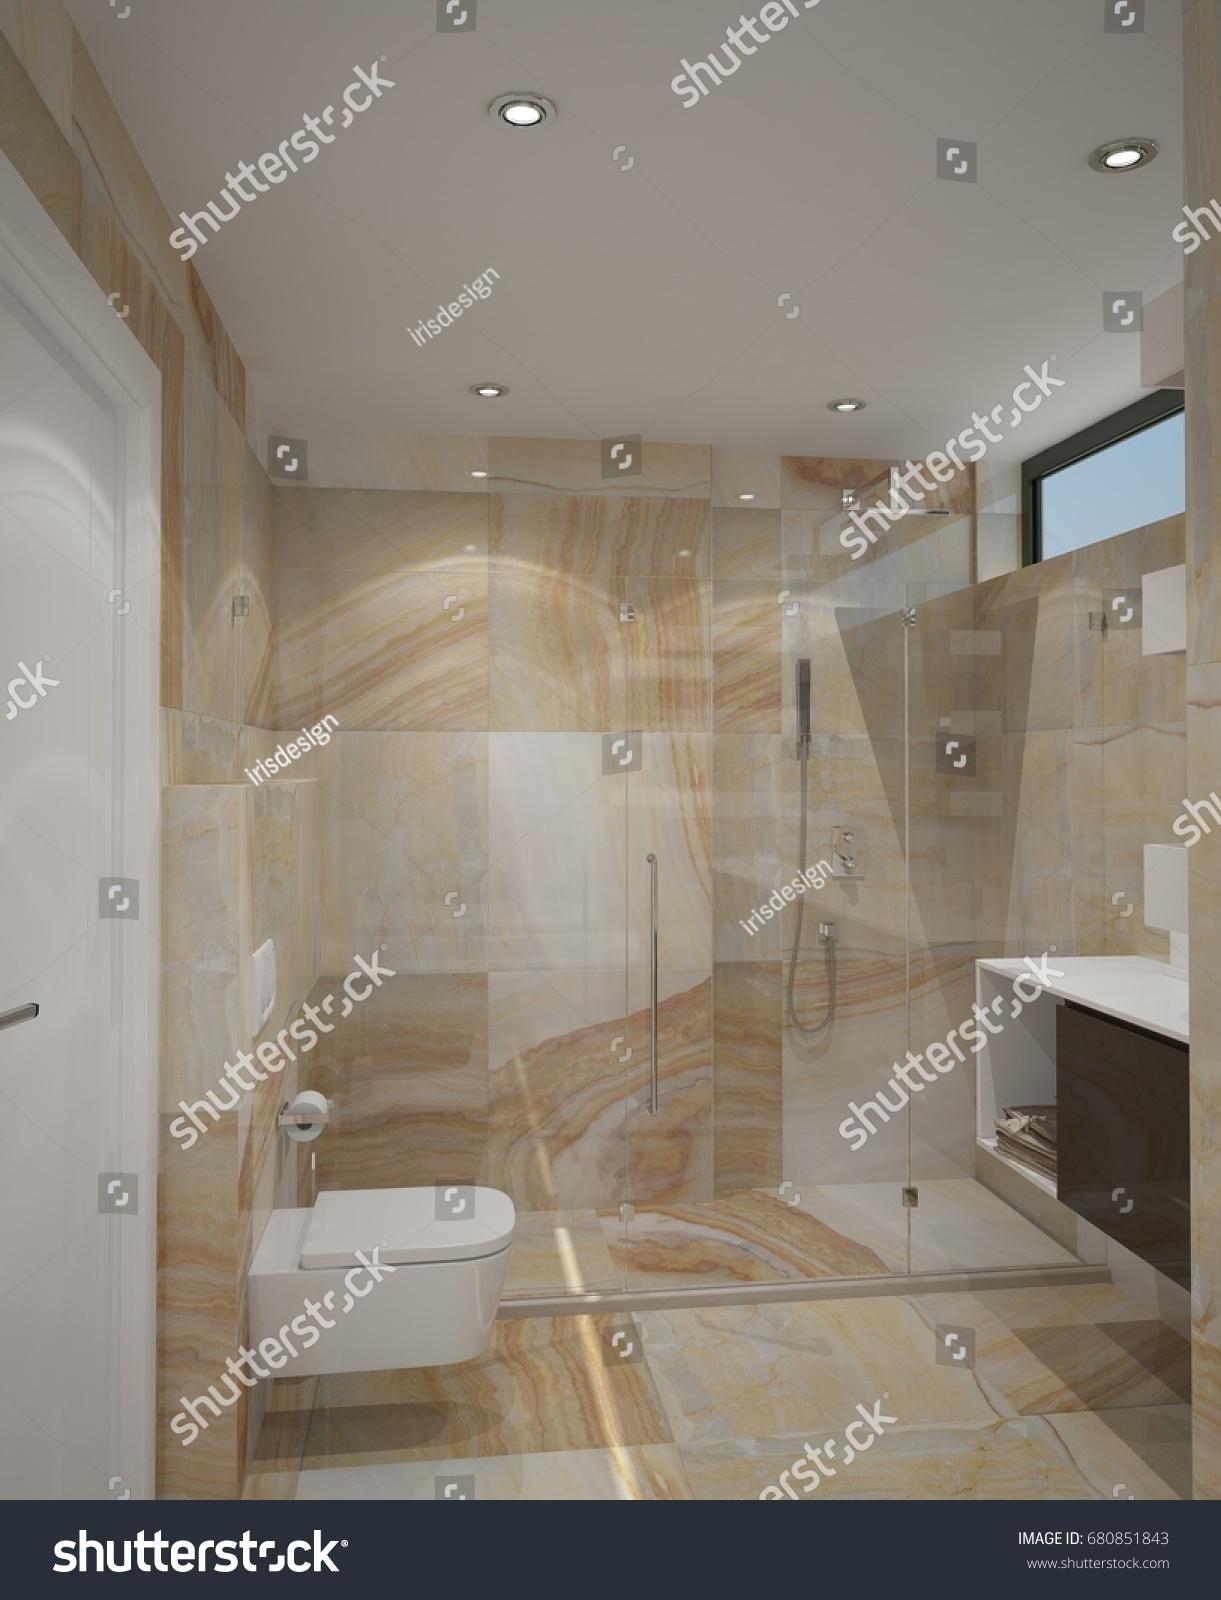 3d rendering bathroom interior design stock illustration for Bathroom interior design 3d